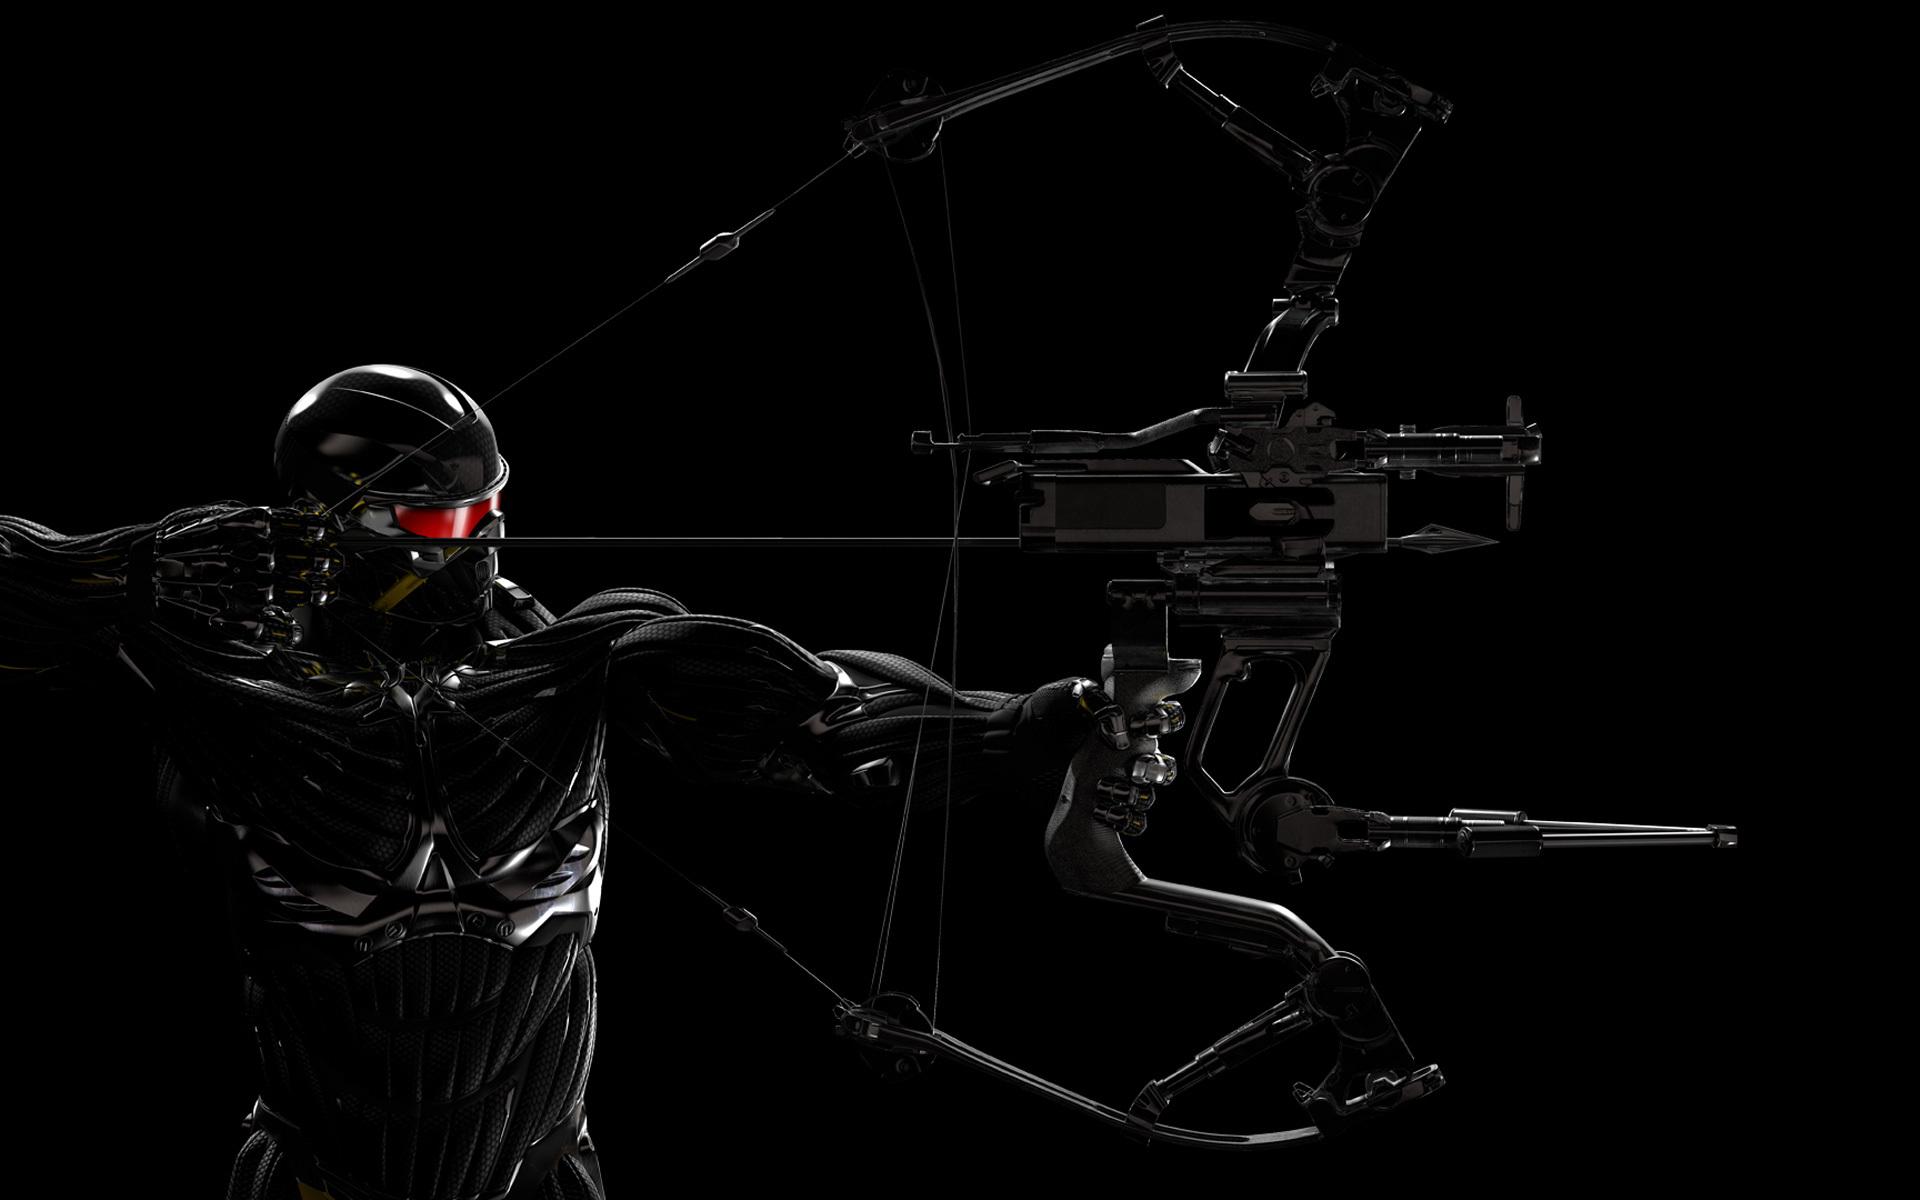 Crysis_3_black_background_man_bow_armor_1920x1200.jpg